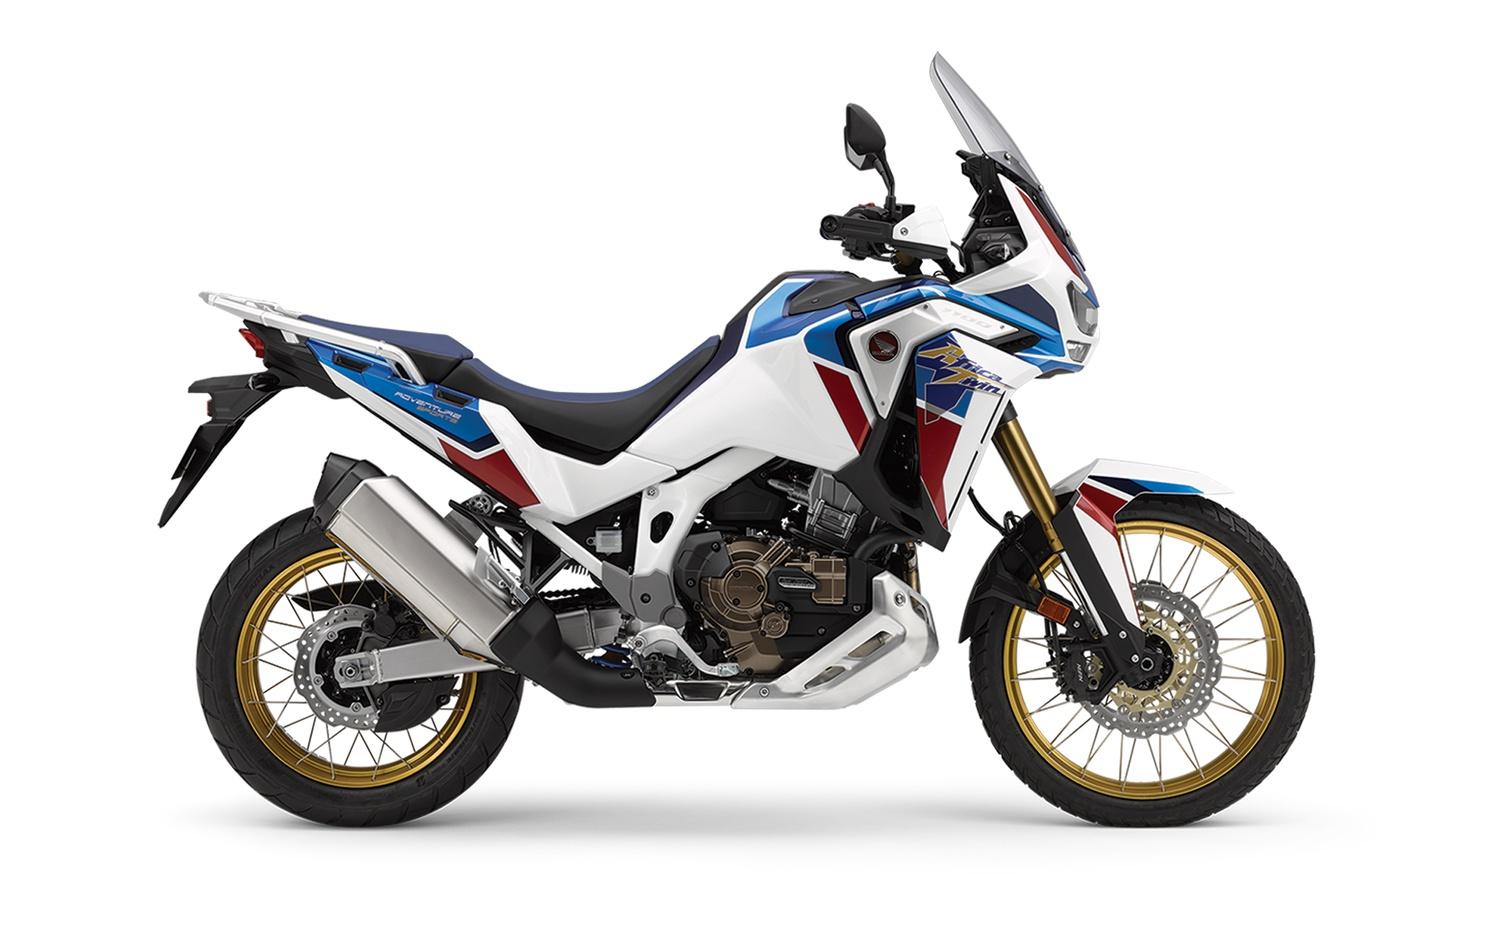 Honda Africa Twin Adventure Sports Tricolore 2020